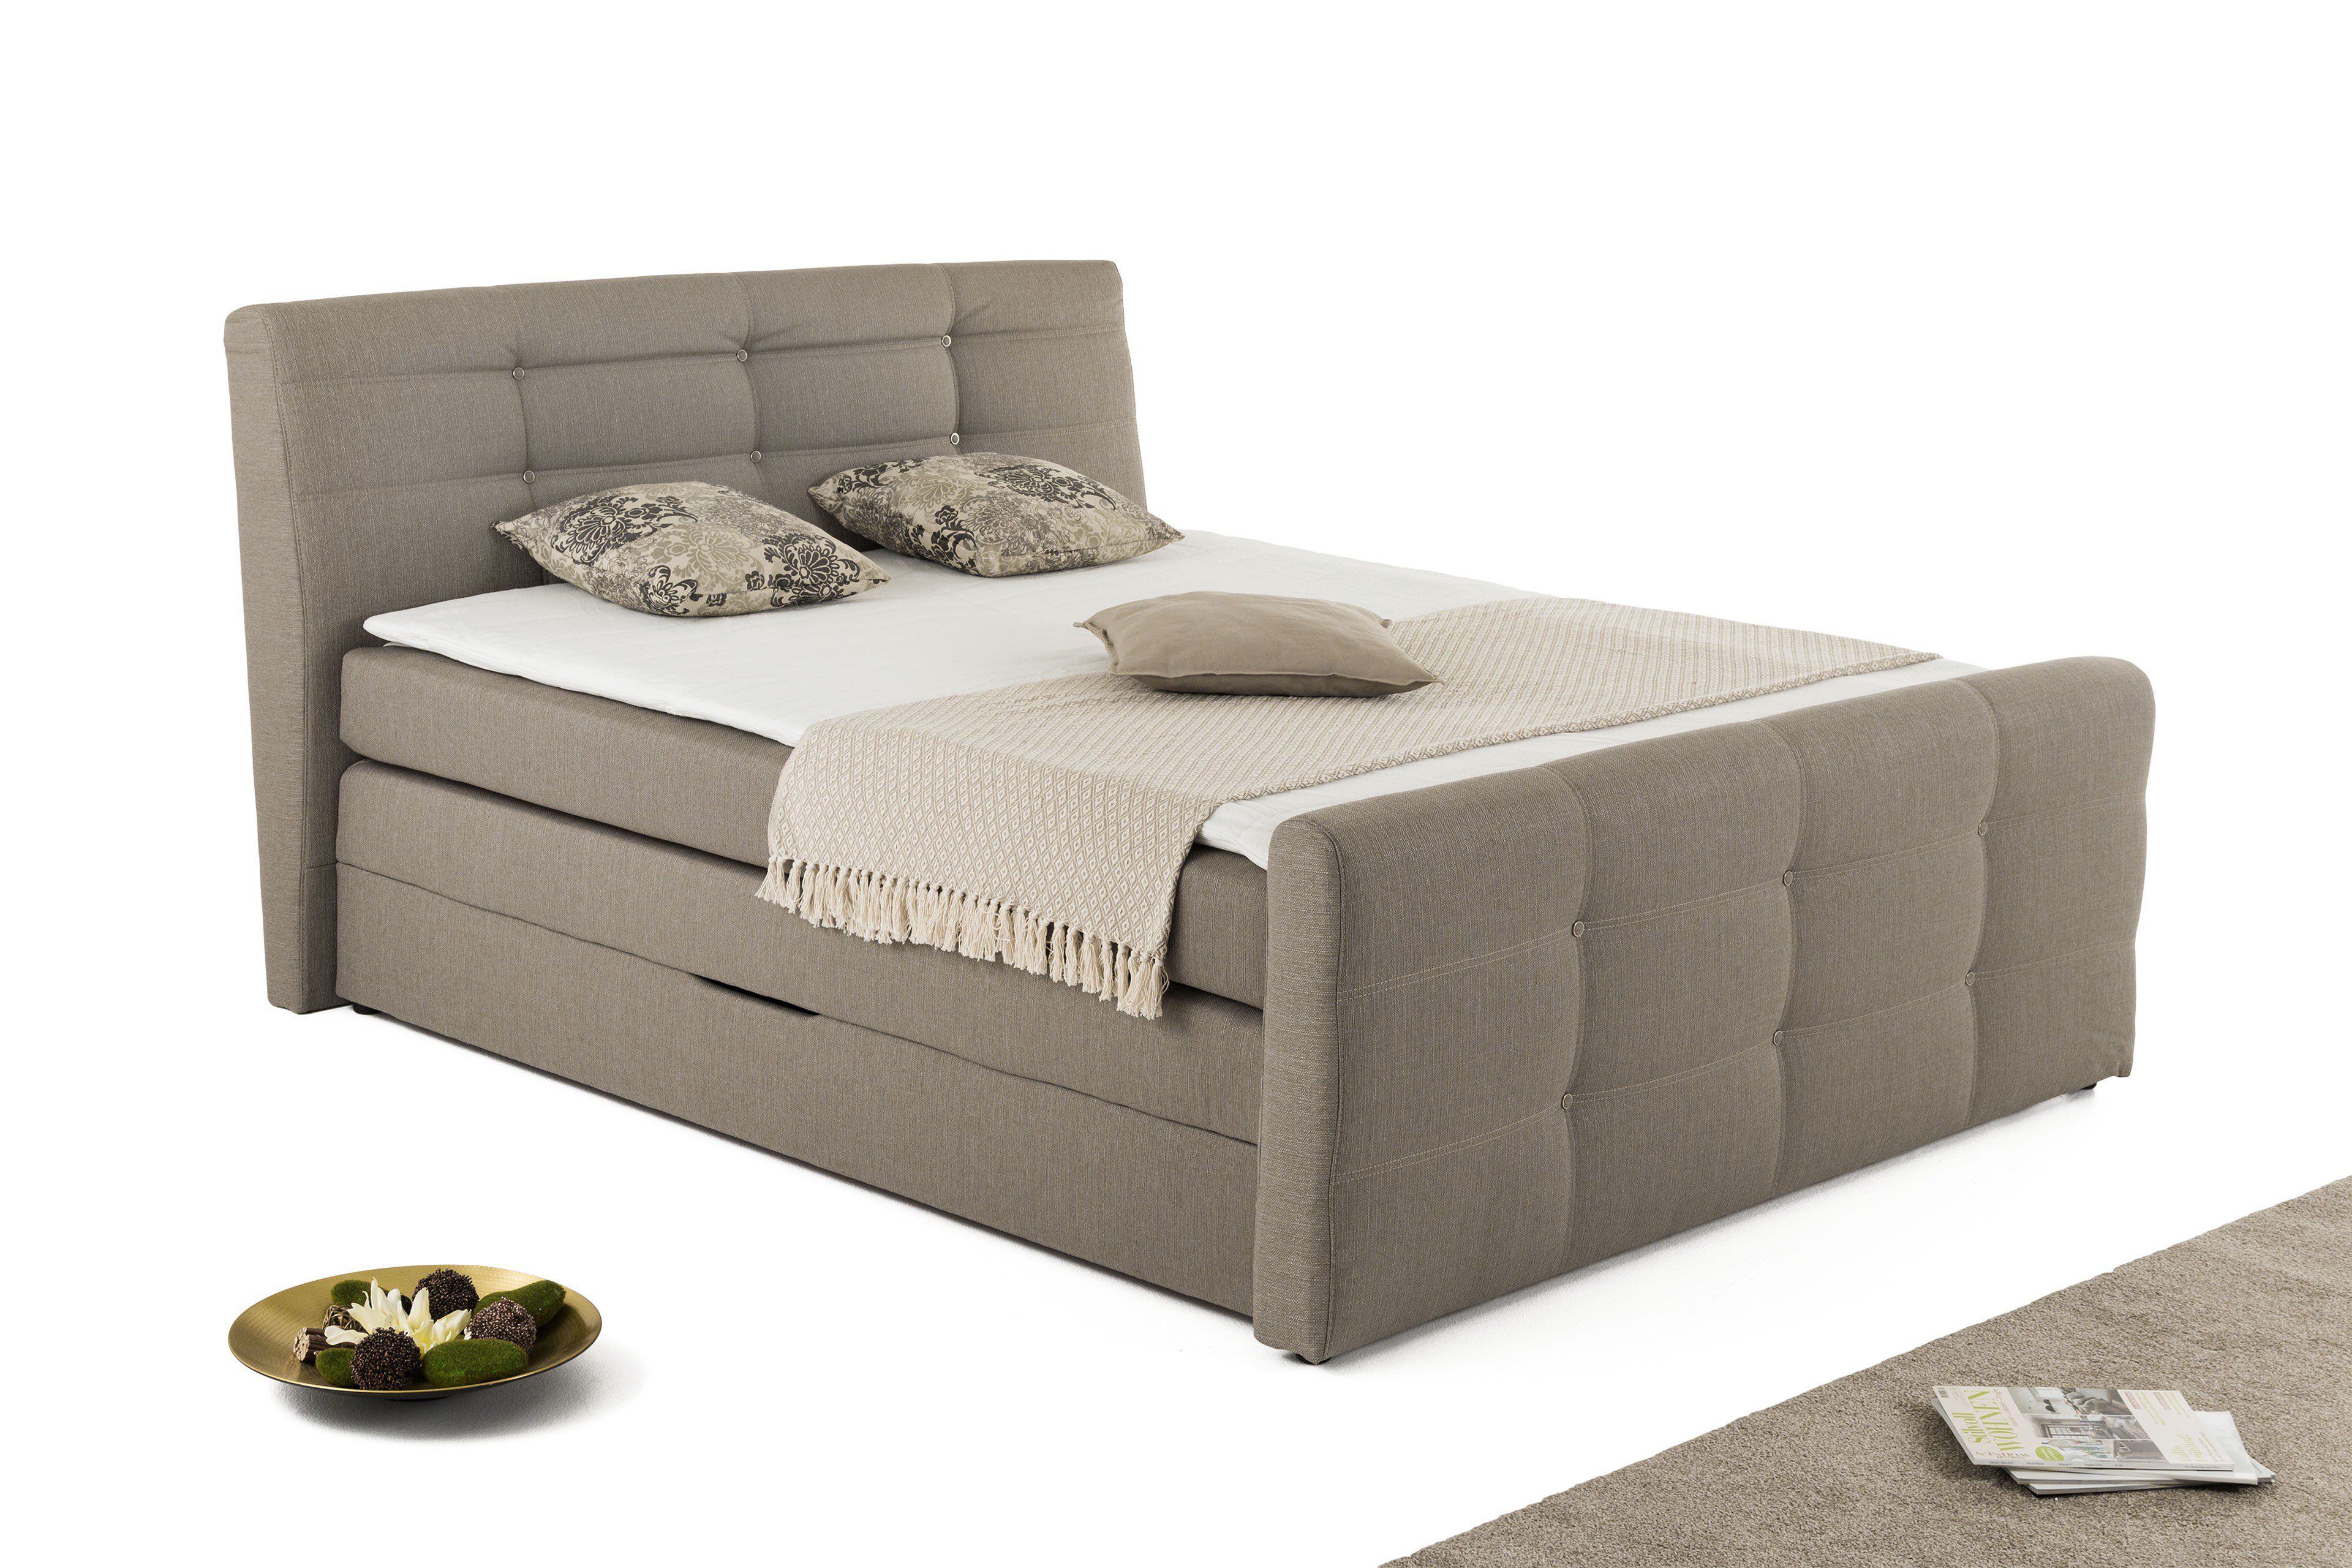 jockenh fer granada leia boxspringbett in beige m bel. Black Bedroom Furniture Sets. Home Design Ideas